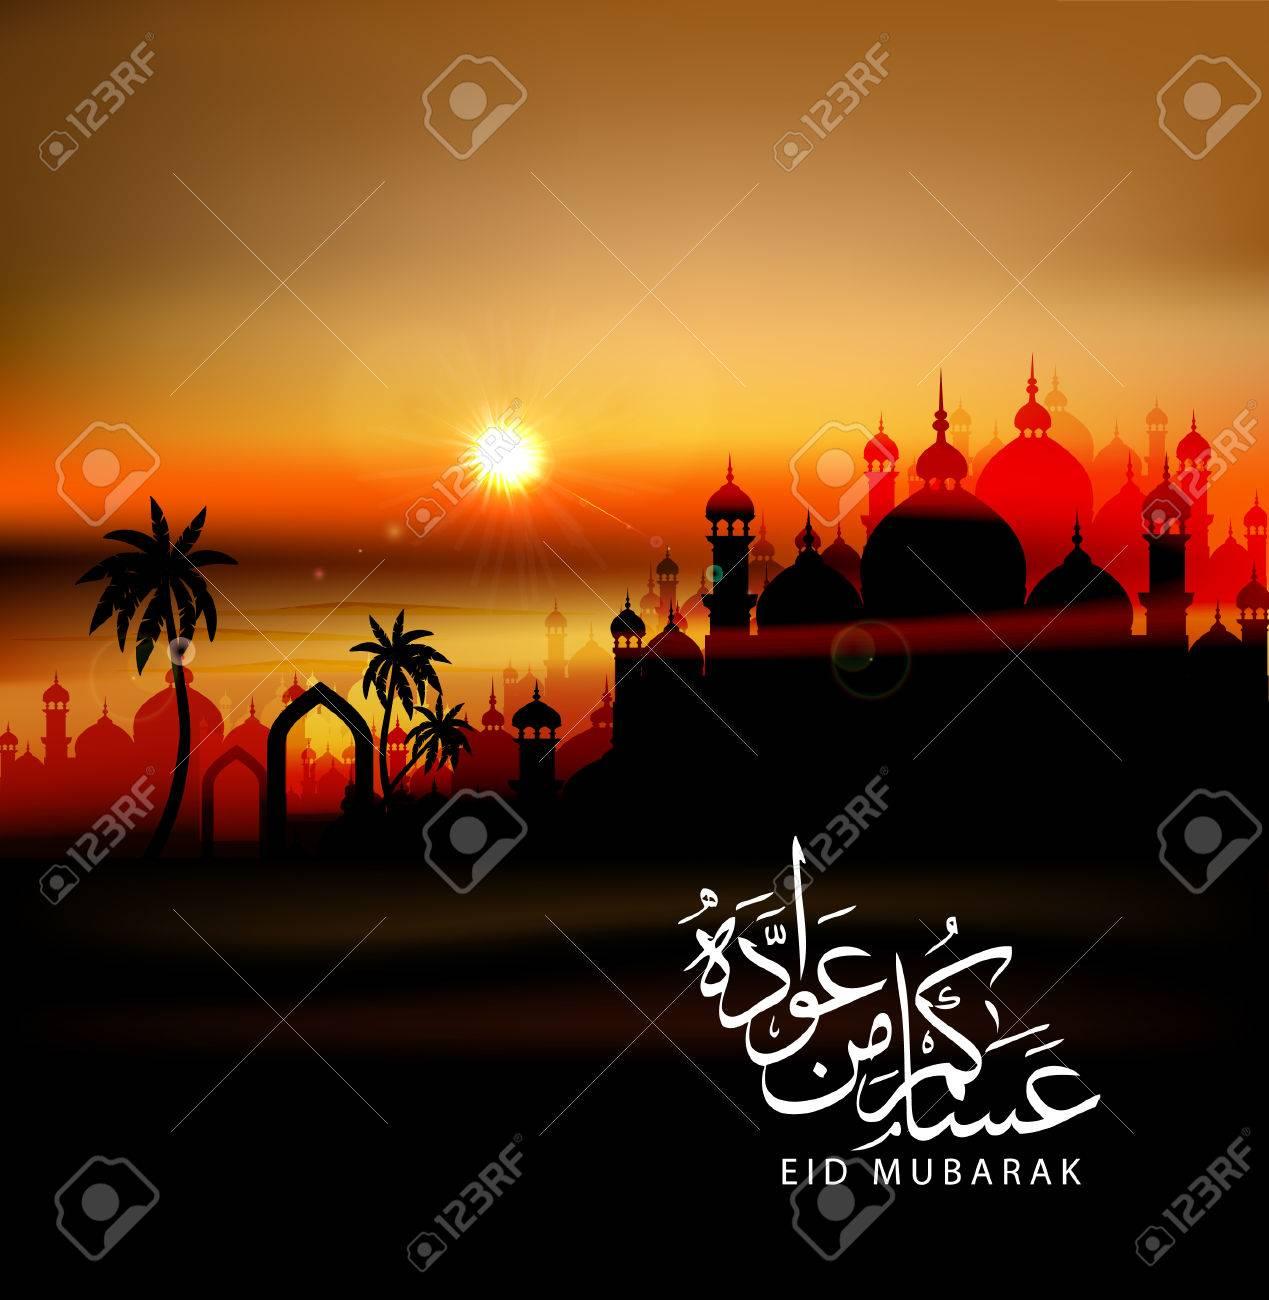 Must see Eid Holiday Eid Al-Fitr Greeting - 65676342--eid-mubarak-greeting-card-islamic-background-for-muslims-holidays-such-as-eid-al-fitr-eid-al-adha-a  Graphic_592498 .jpg